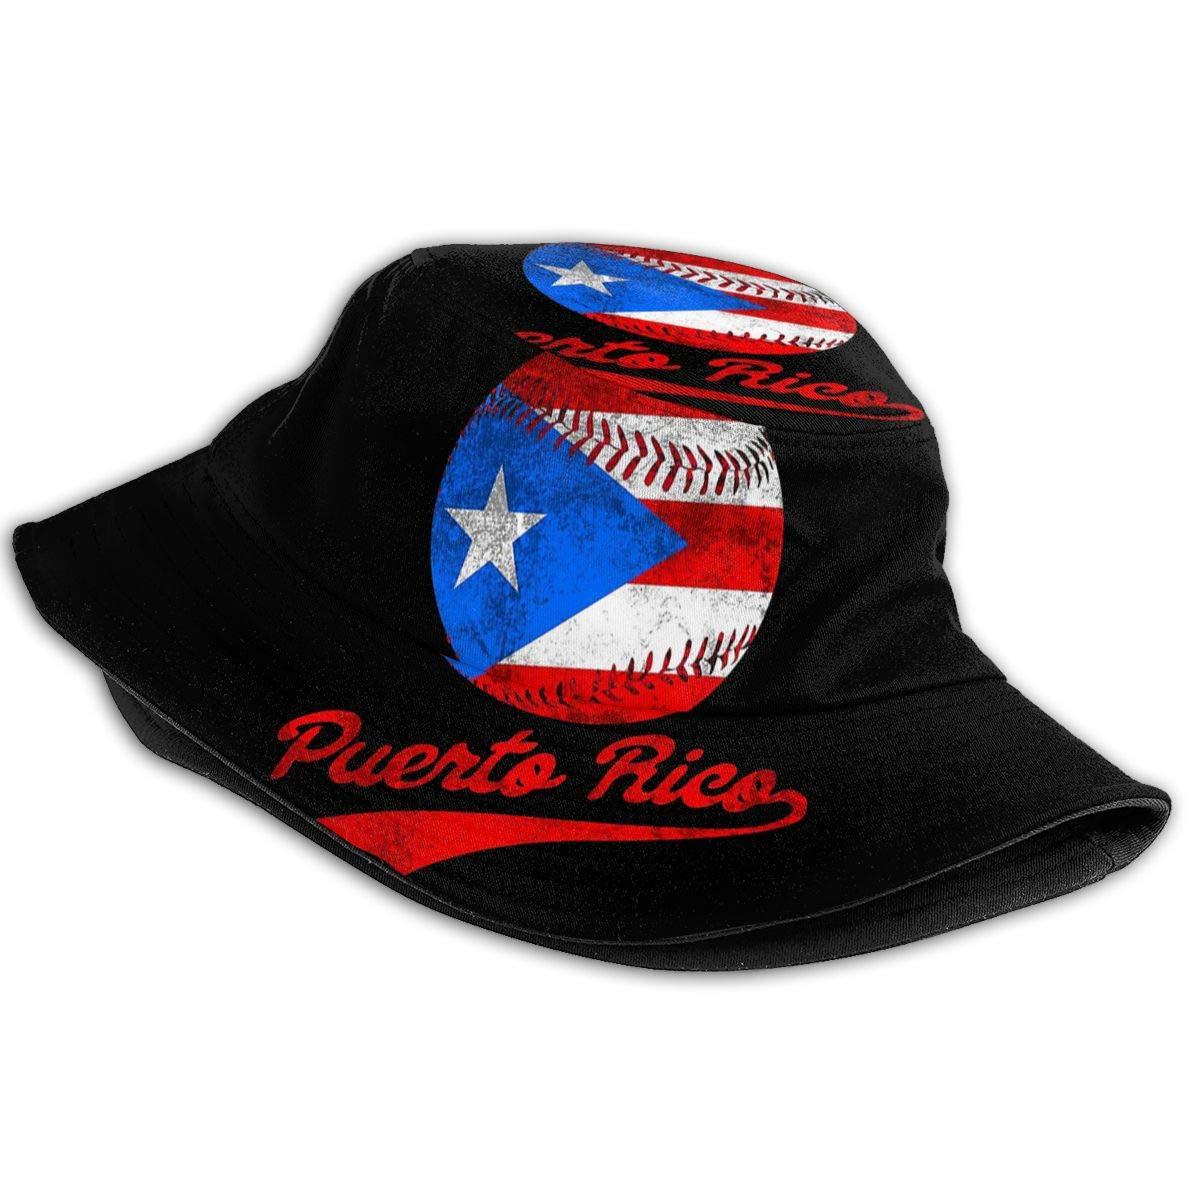 Bucket Hat Packable Reversible Puerto Rico Baseball Ball Flag Puerto Rican Print Sun Hat Fisherman Hat Cap Outdoor Camping Fishing Safari for Men Women Black